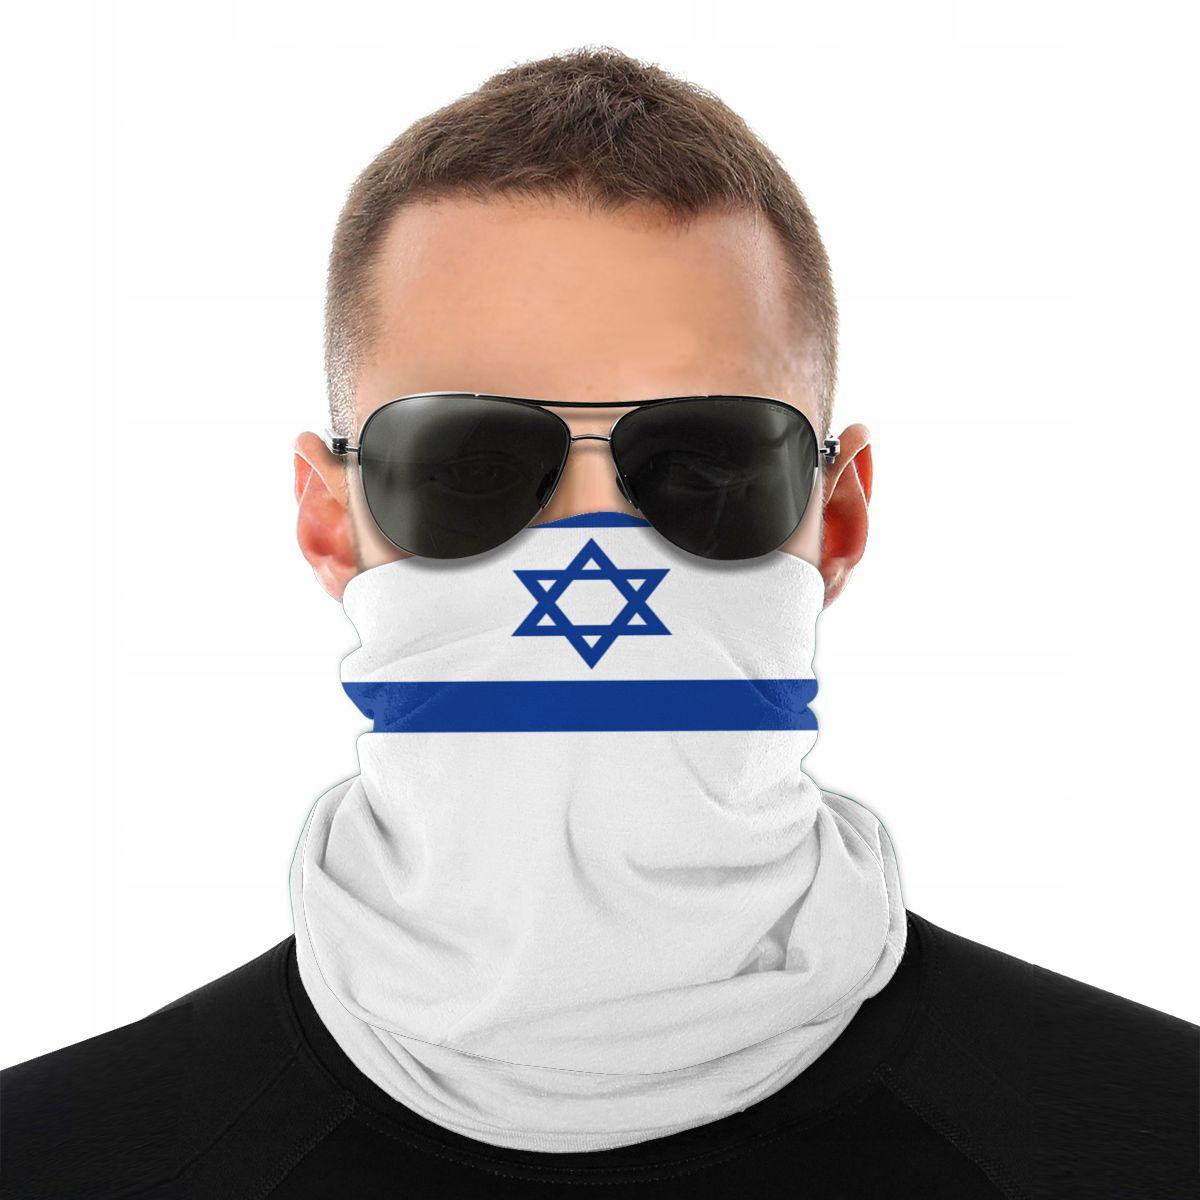 Israel Flag Scarves Neck Face Mask Unisex Halloween Neck Warmer Seamless Bandana Versatility Headband Outdoor Hiking